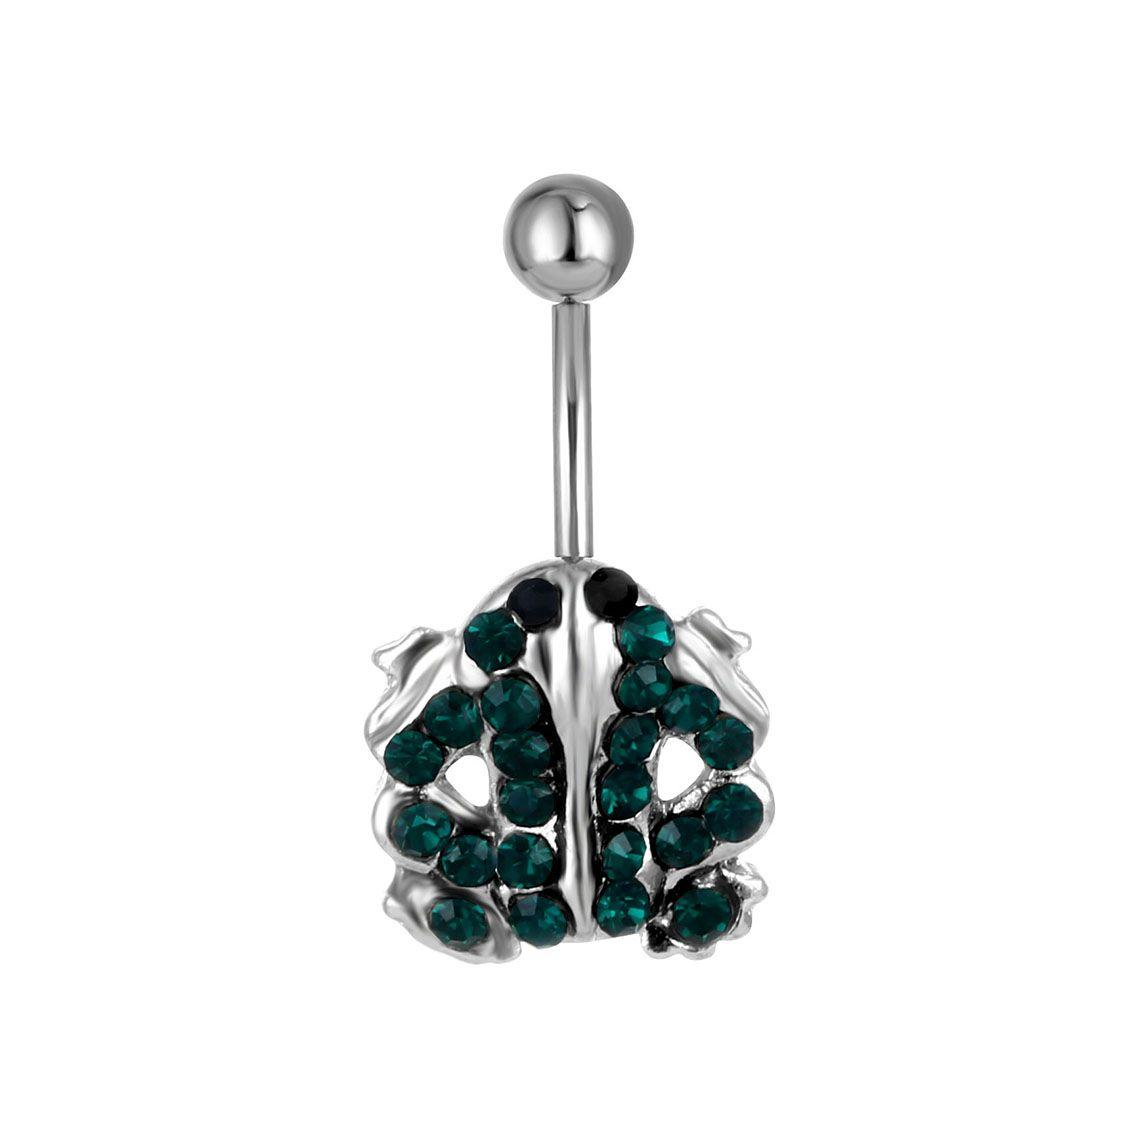 D0493 (1 Färg) Groda Navel Belly Ring, Piercing Body Jewlery Belly Button Ring, Fixing Belly Bar (10PCS / Lot) JFC-5464